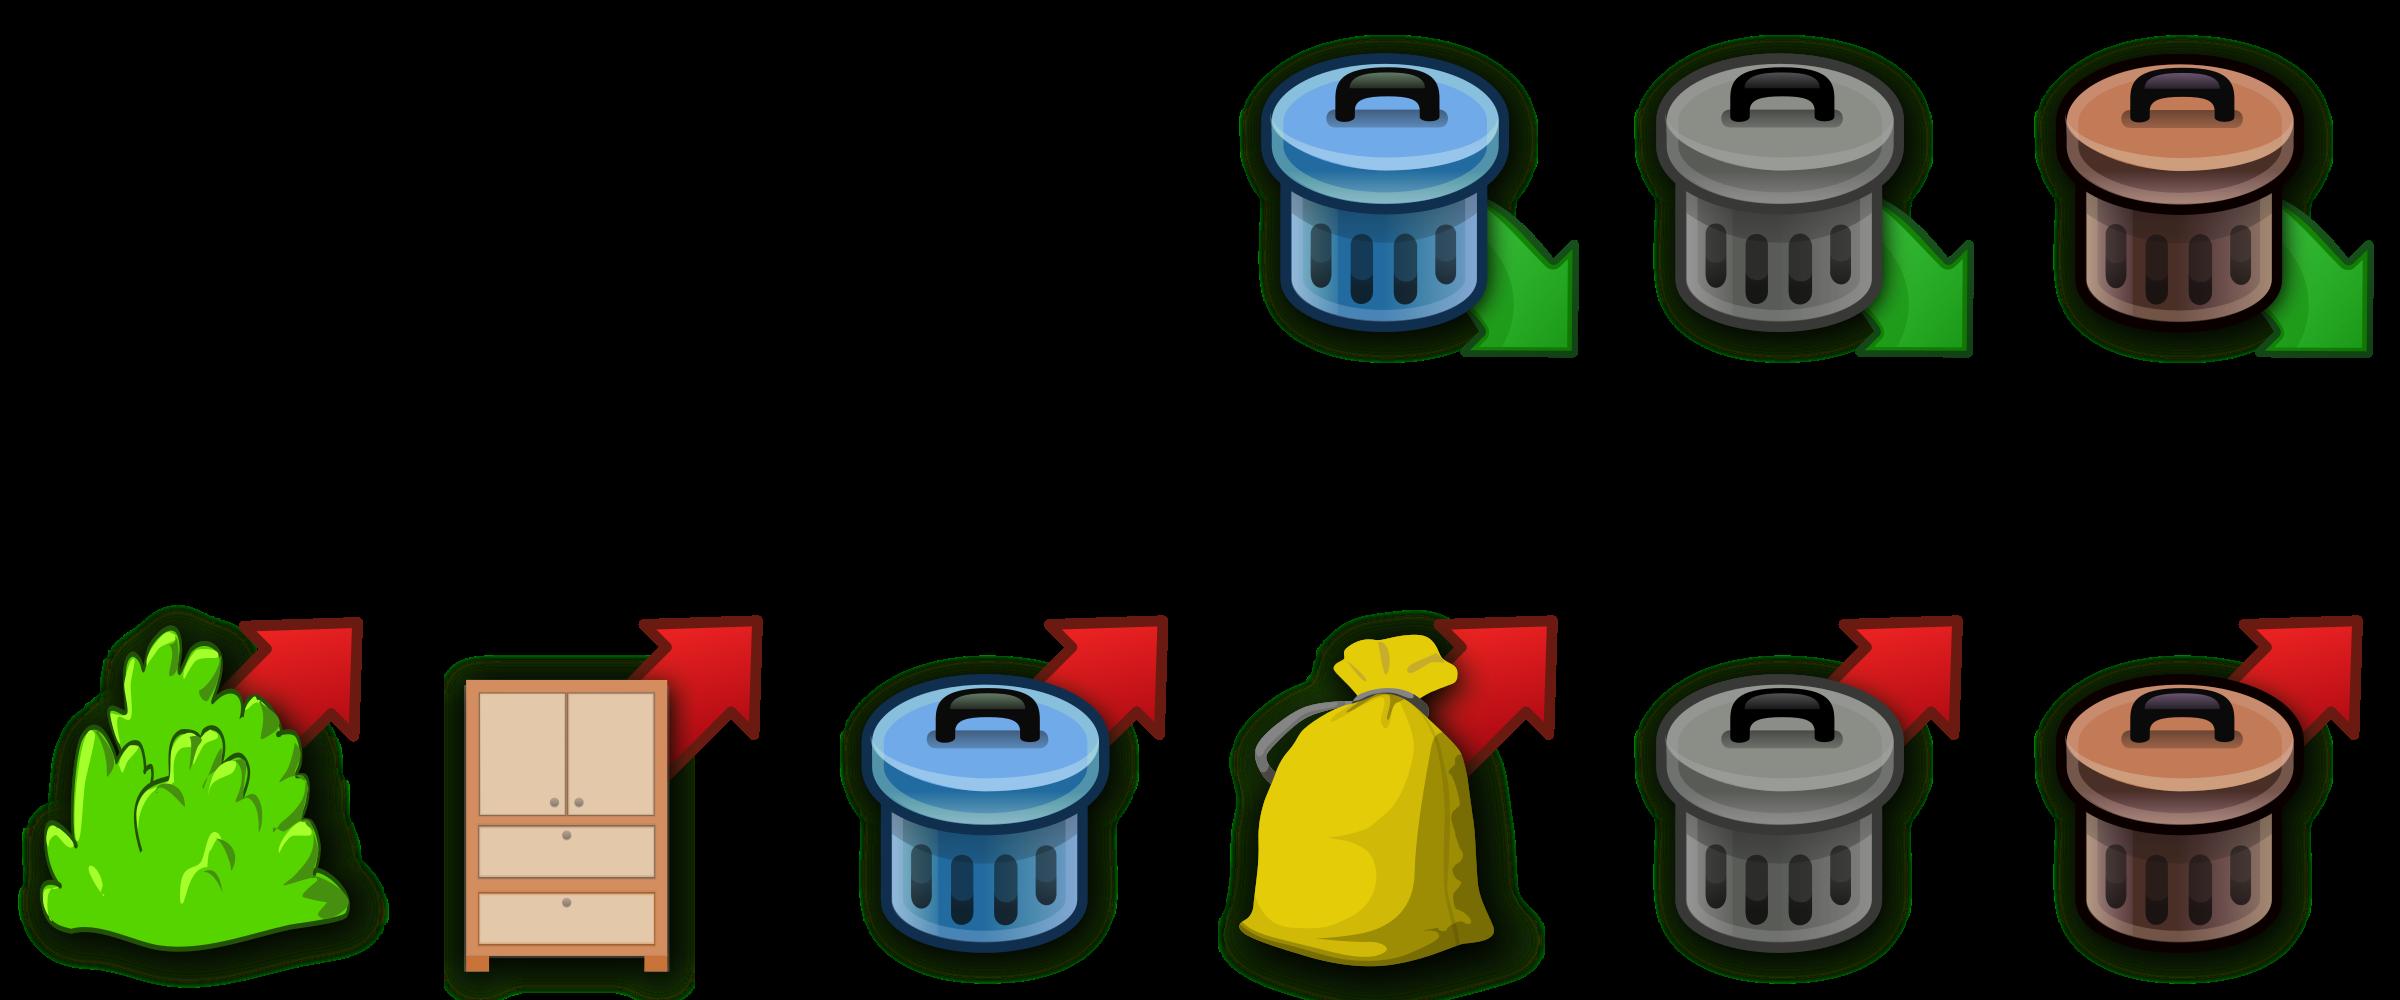 Trash icons big image. Garbage clipart waste separation